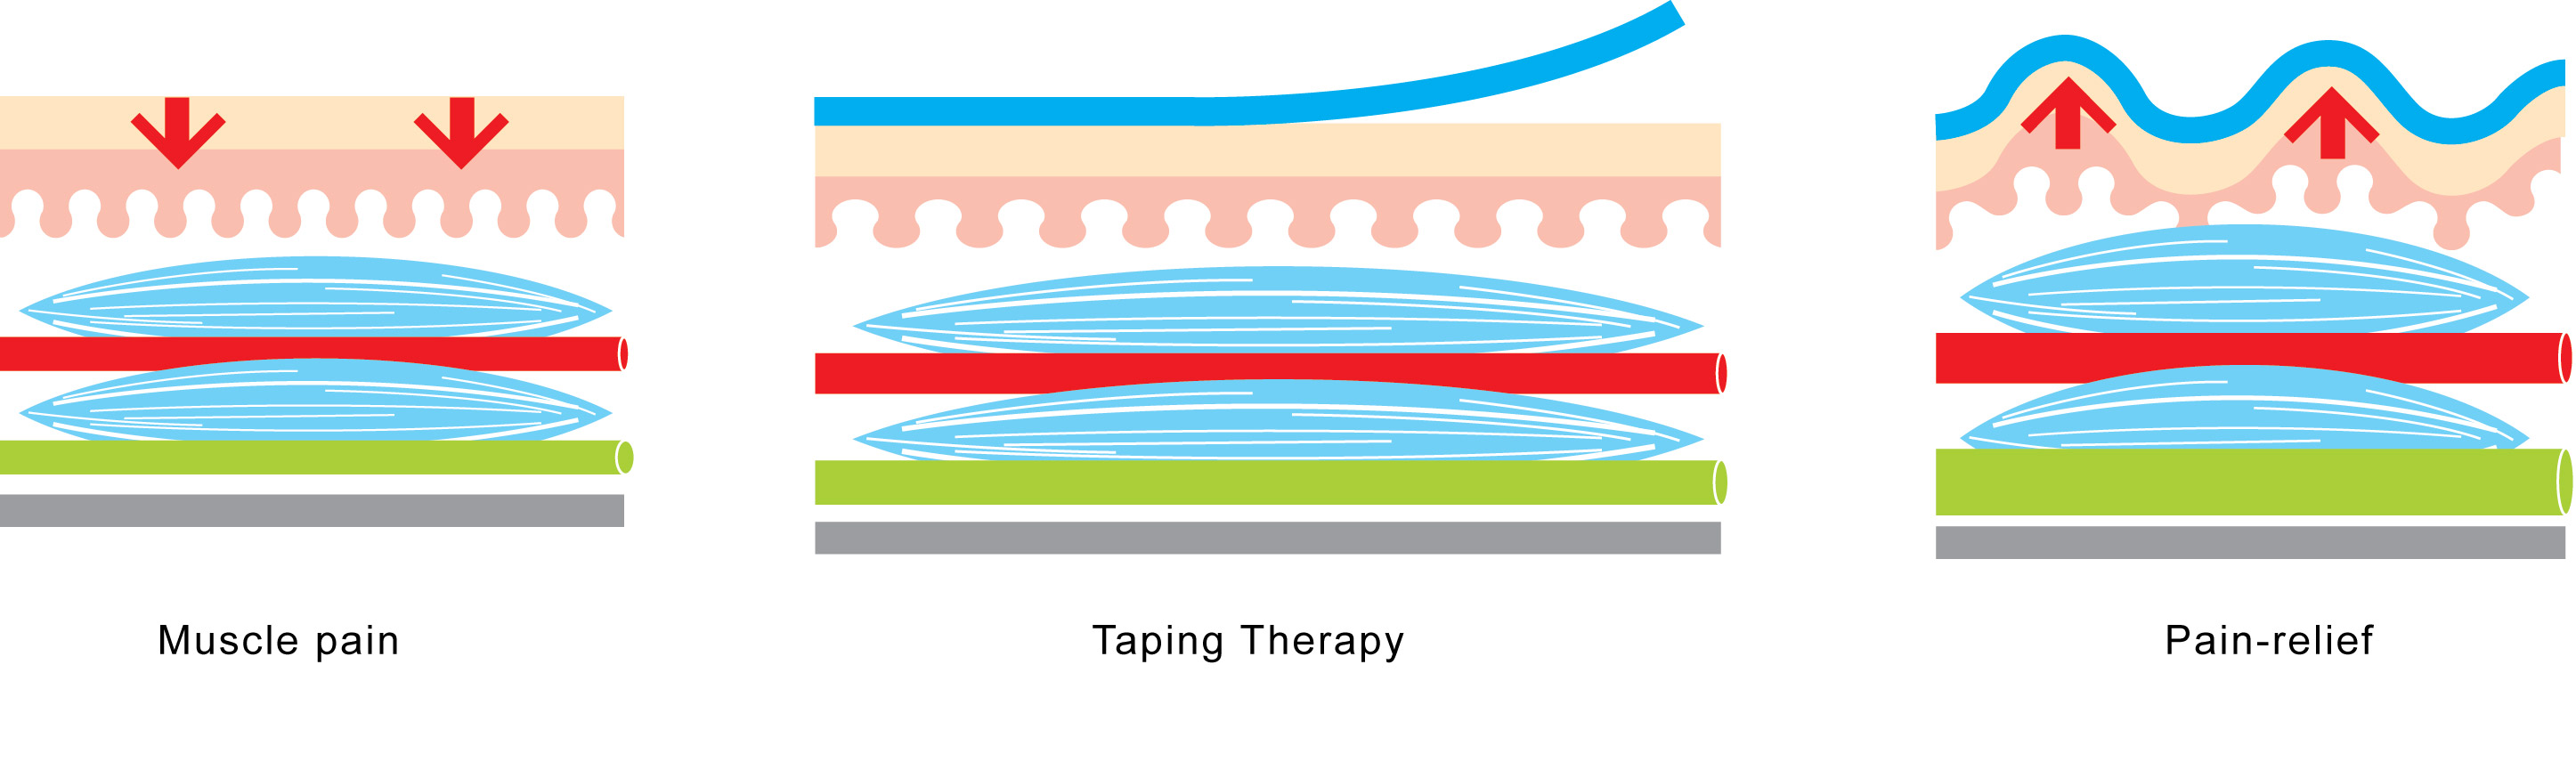 zdravljenje s k.trakovi